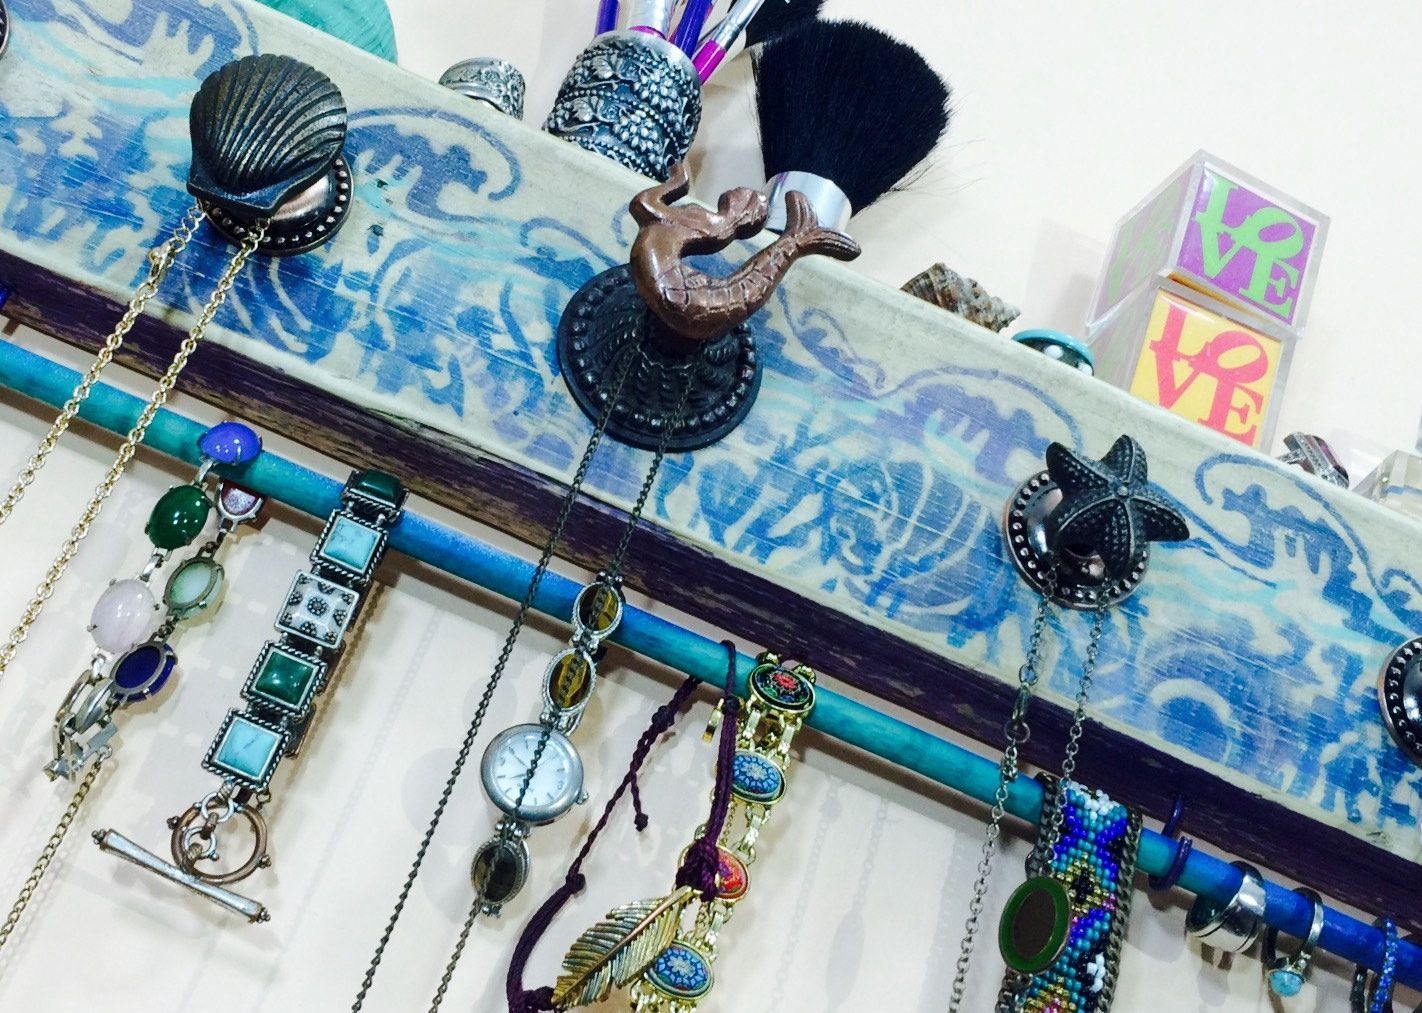 Necklace holder jewelry organizer reclaimed wood art decor wall